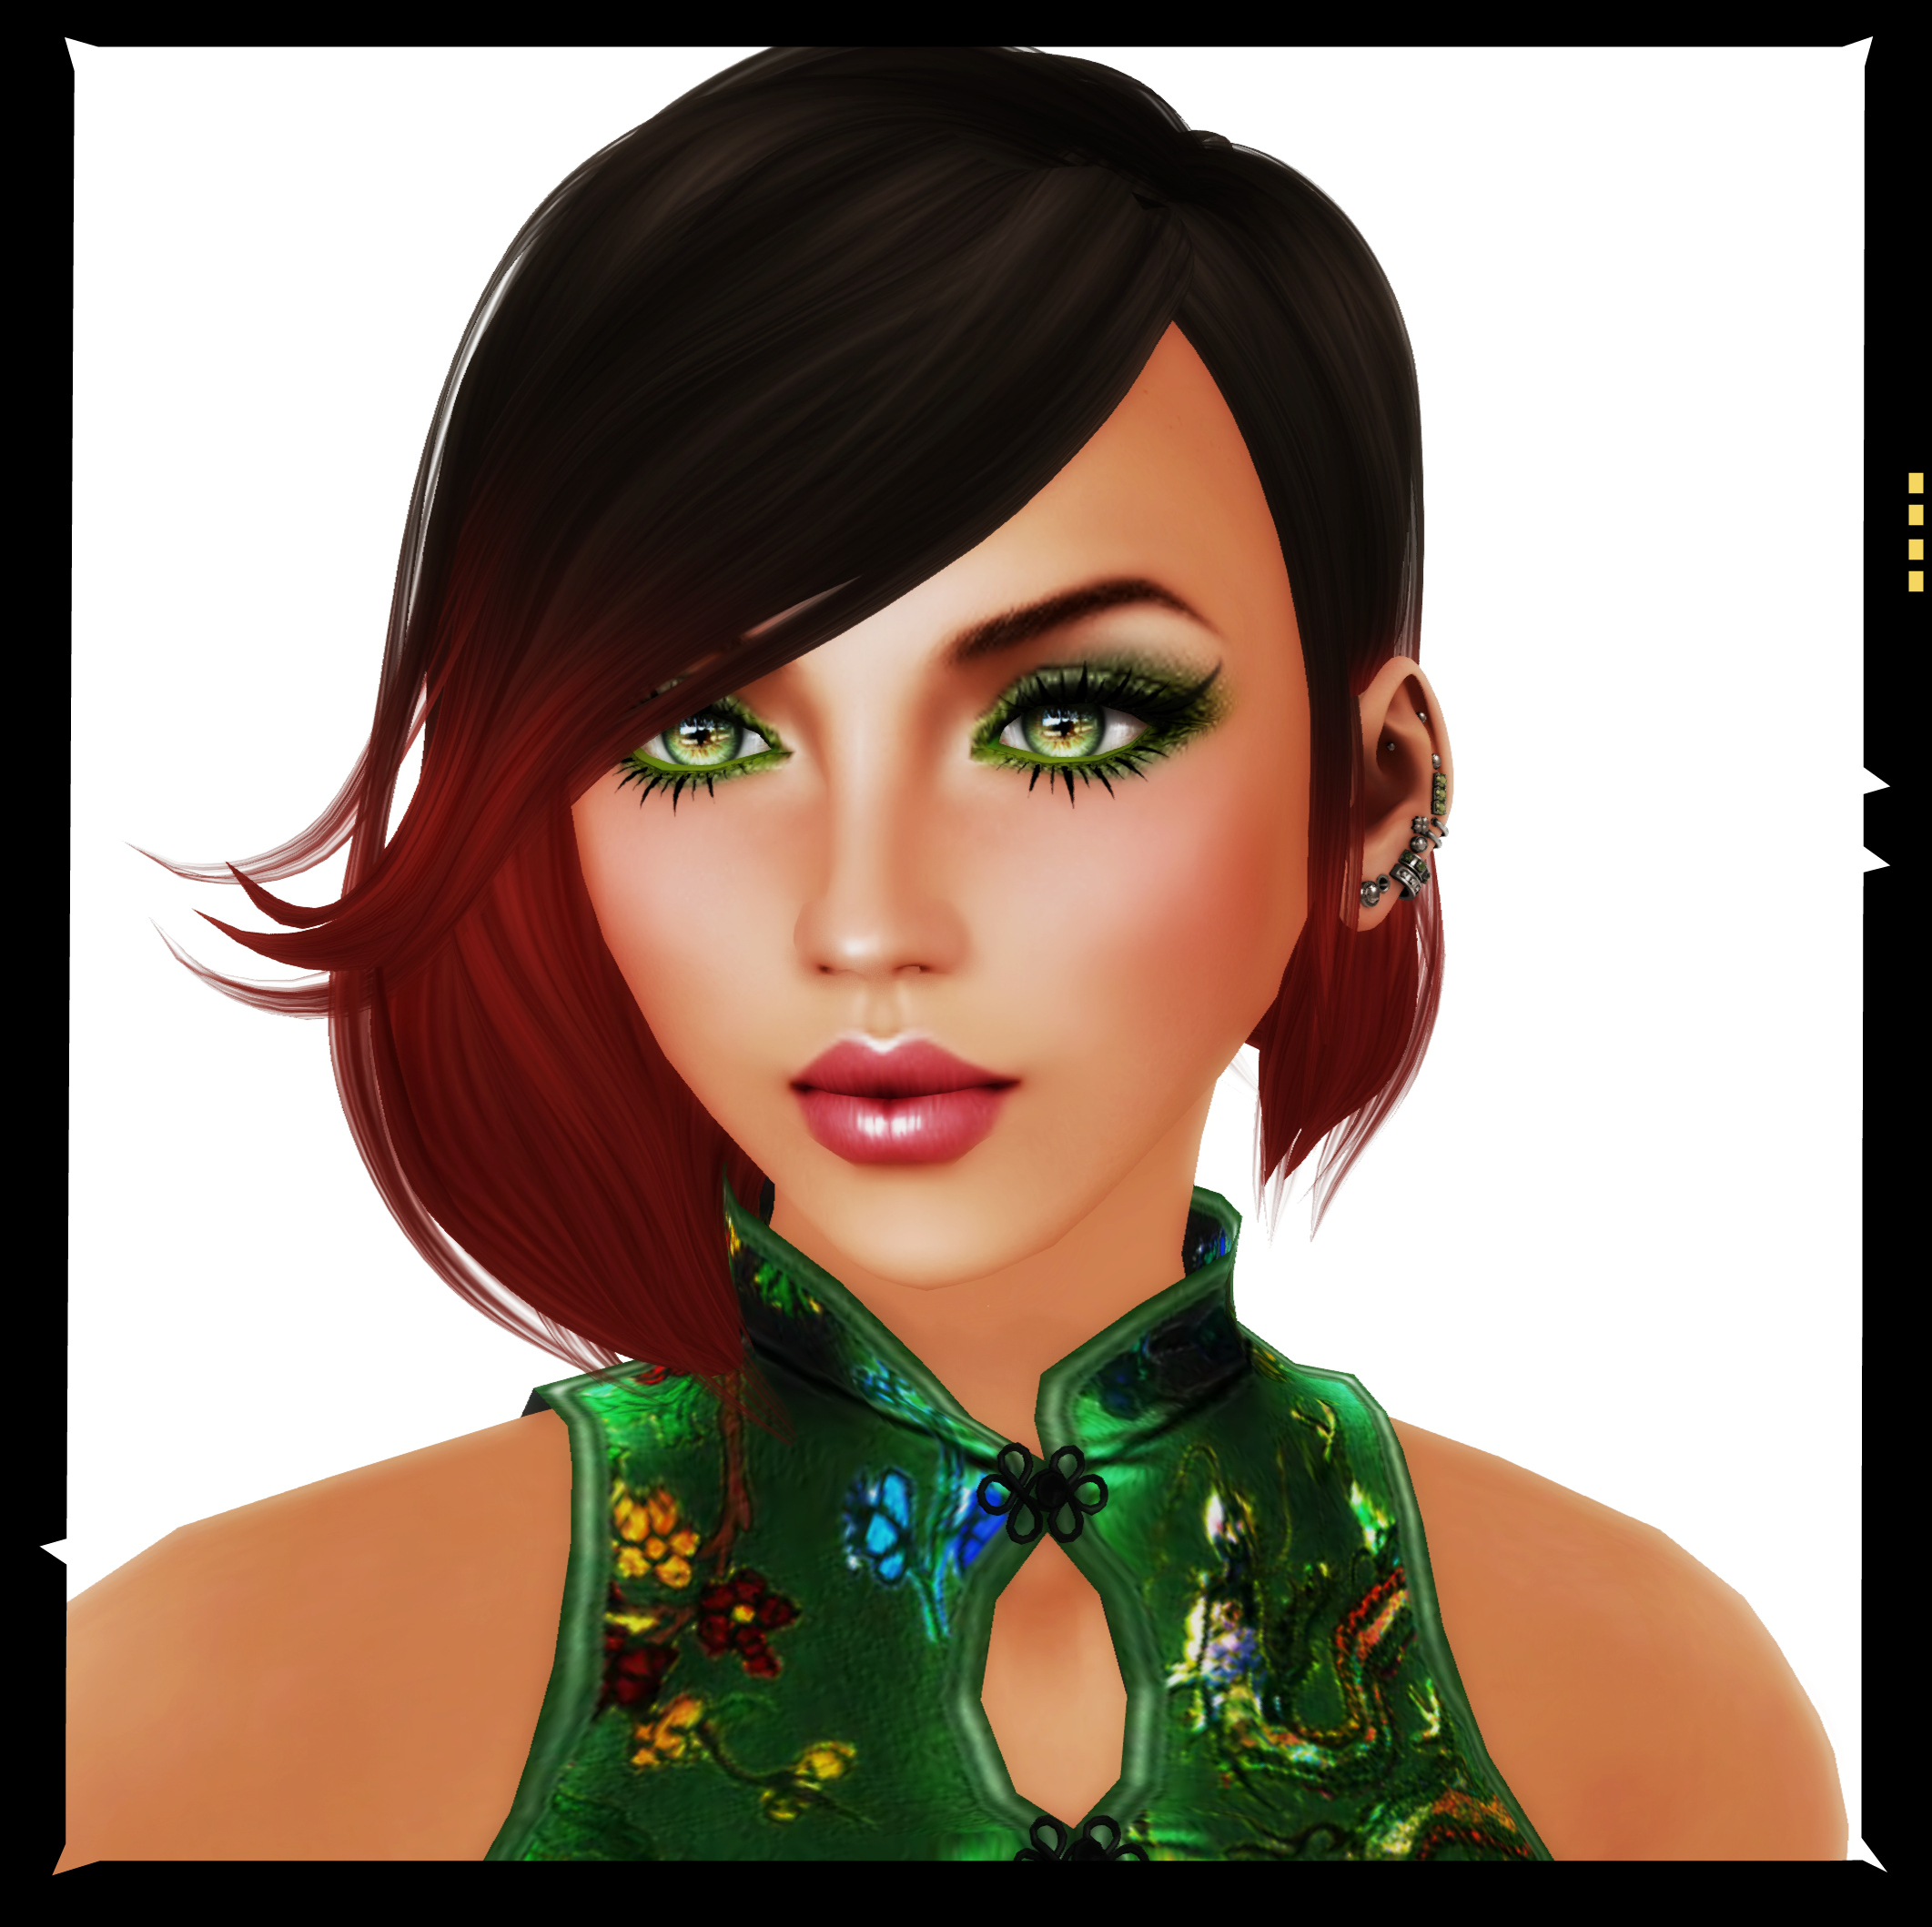 Fantasy Makeup - Fabulous Ser du kan skape